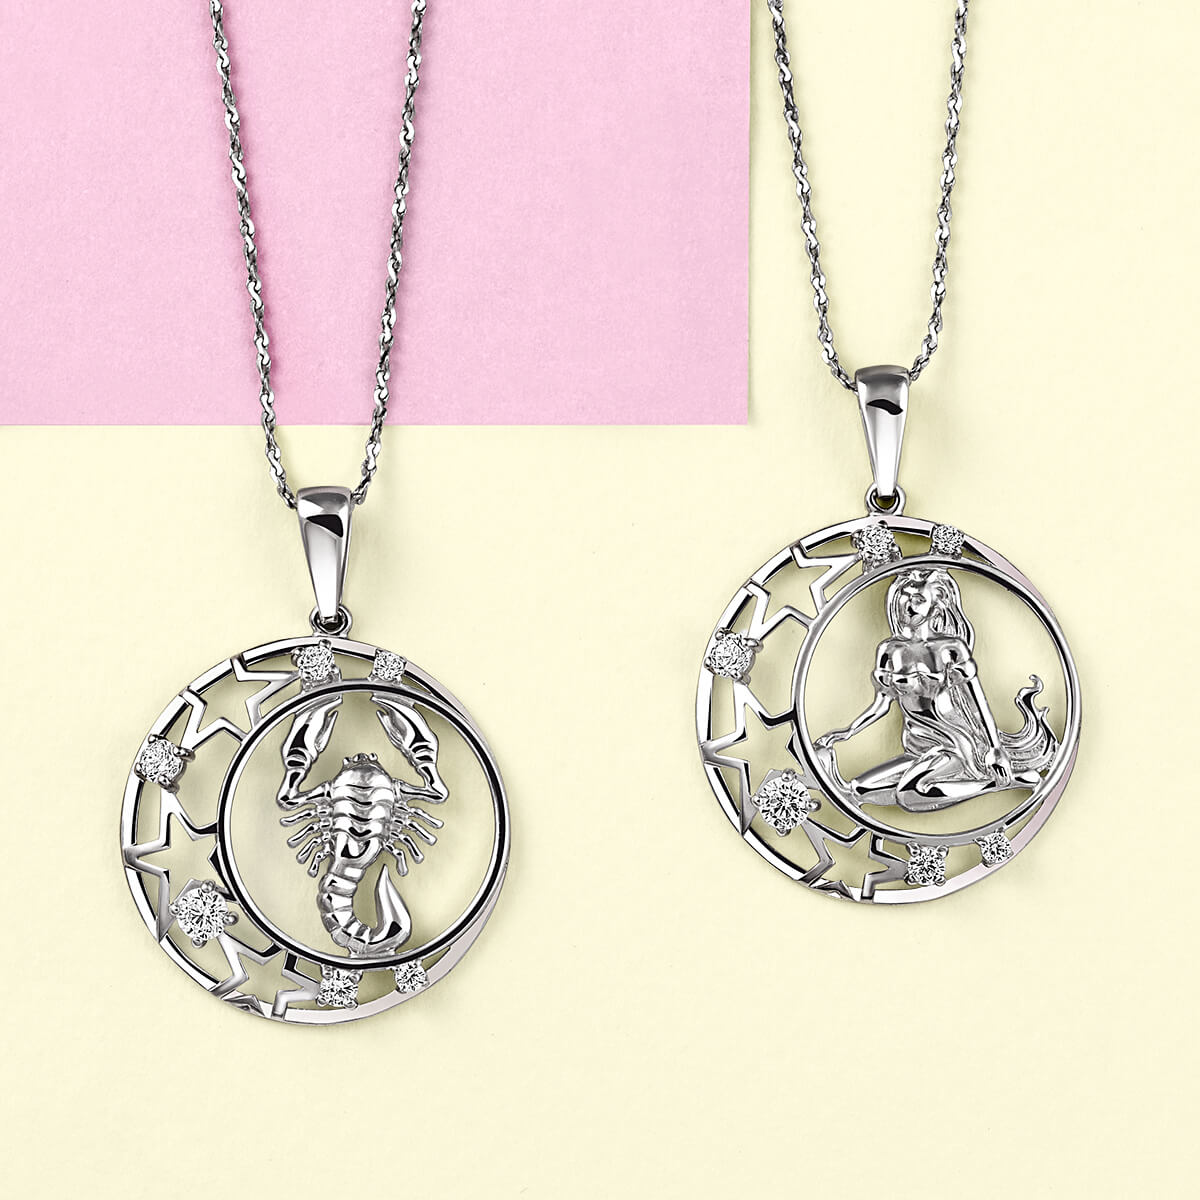 Подвеска SOKOLOV из серебра с фианитами, знак зодиака Скорпион